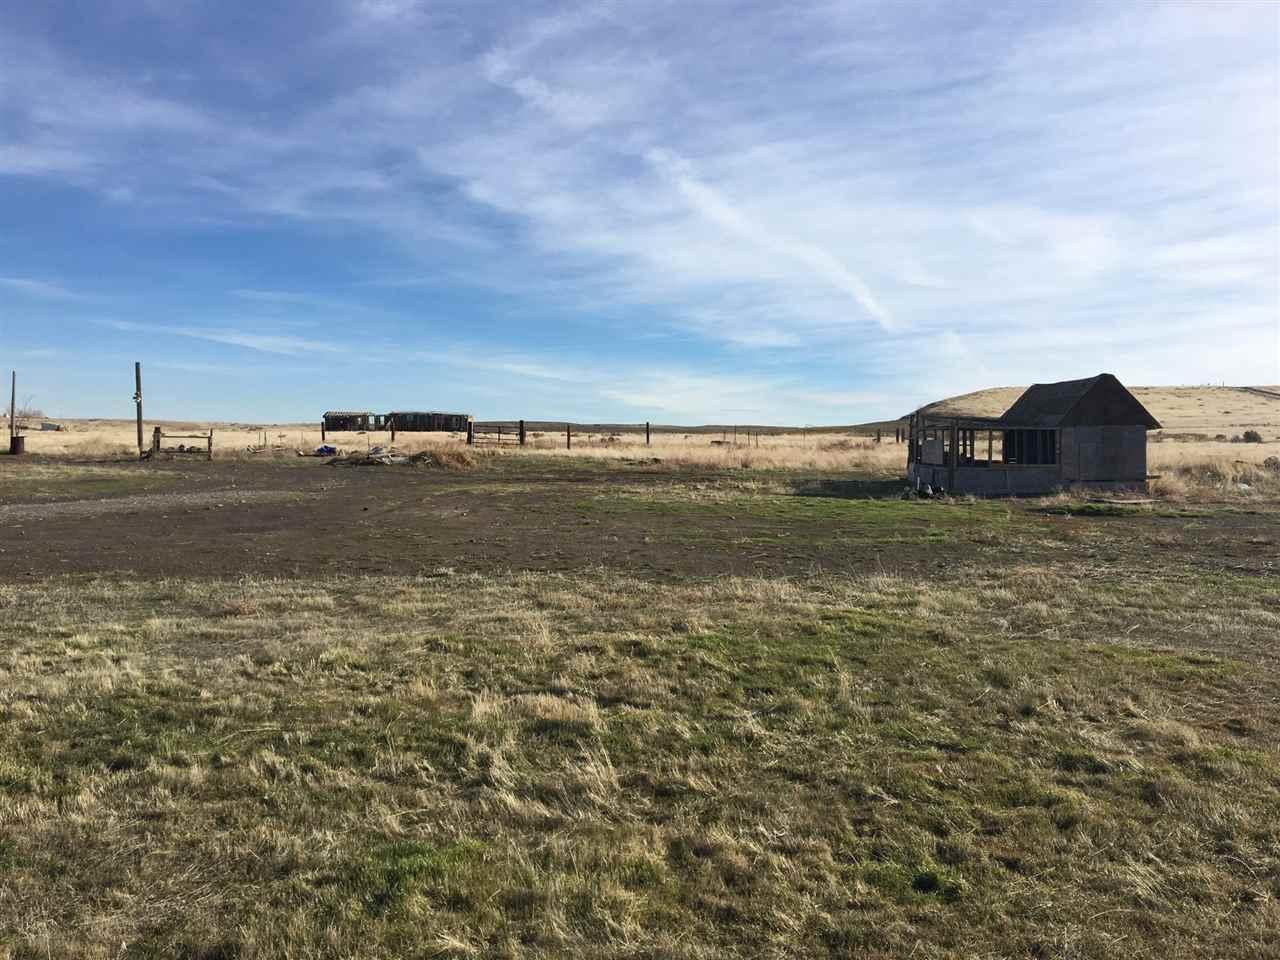 独户住宅 为 销售 在 7258 Pony Lane 7258 Pony Lane Marsing, 爱达荷州 83639